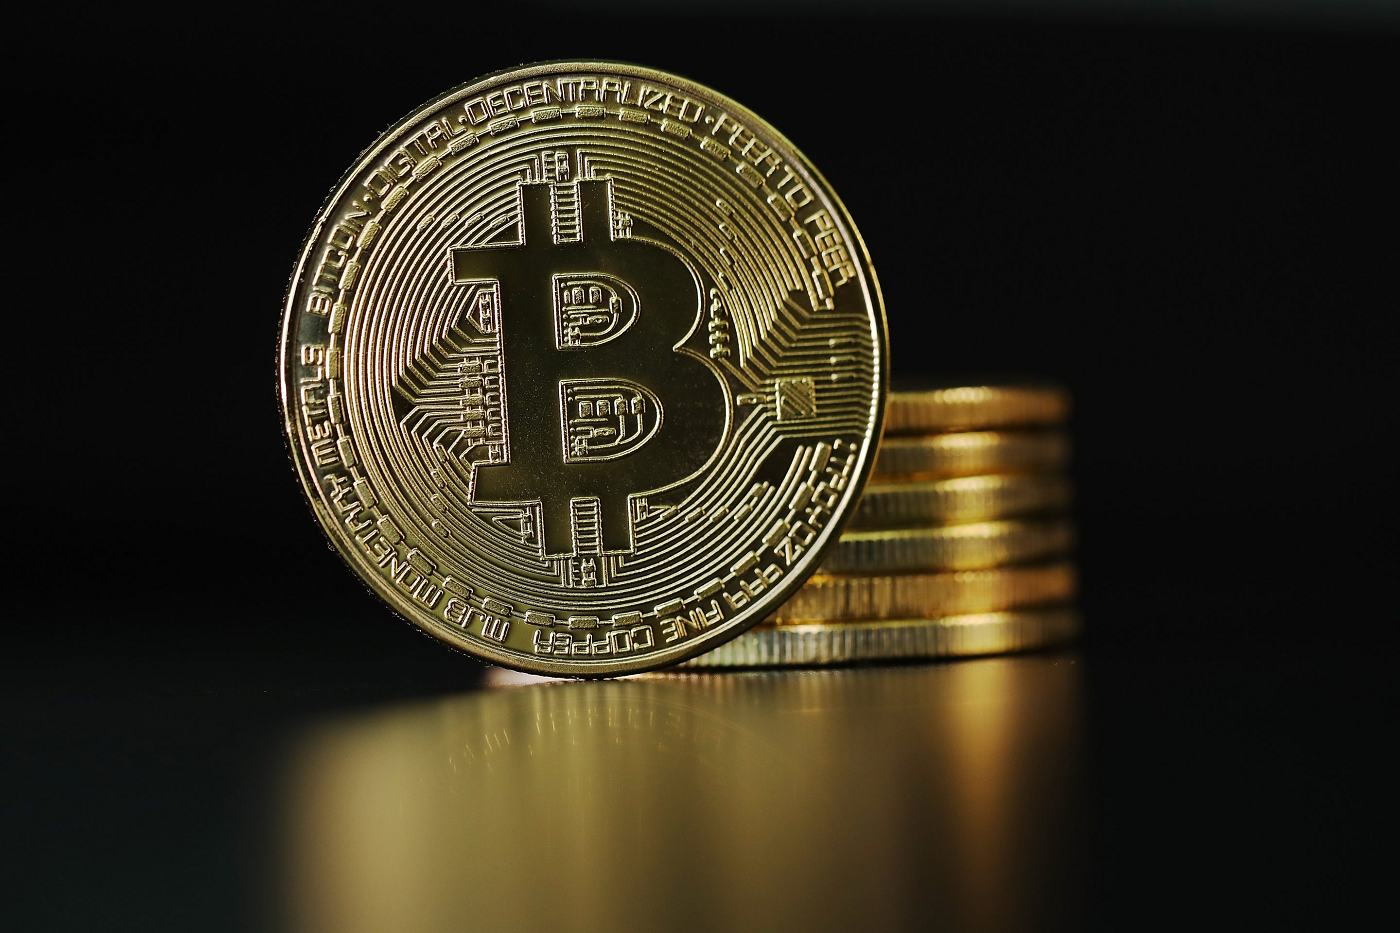 The Future of Bitcoin www.businesstoday.co.ke